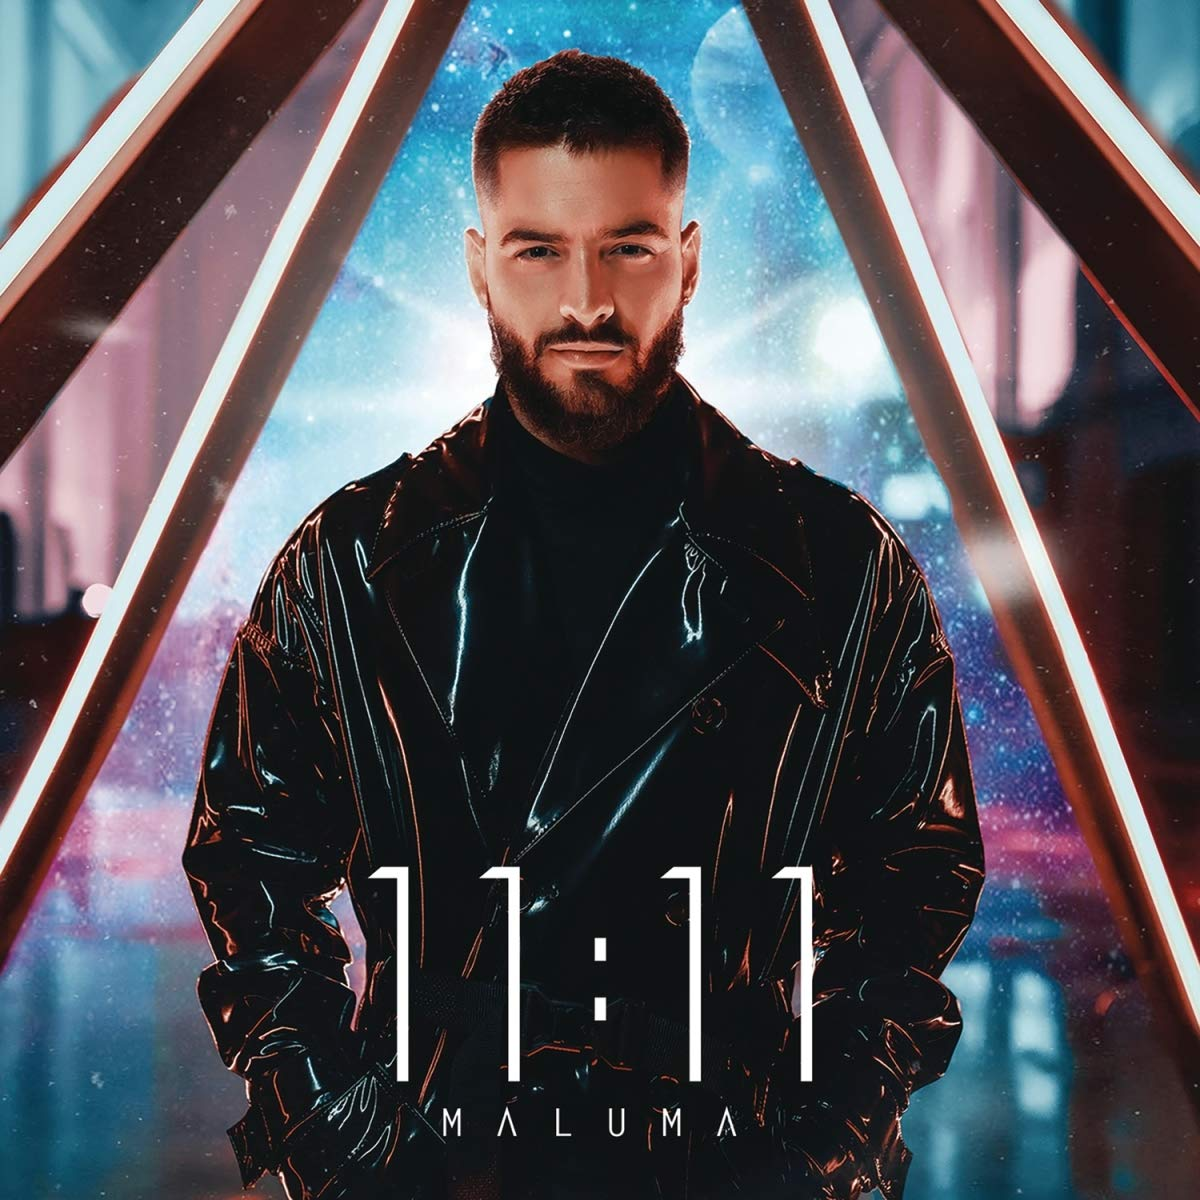 11PM - 11:11